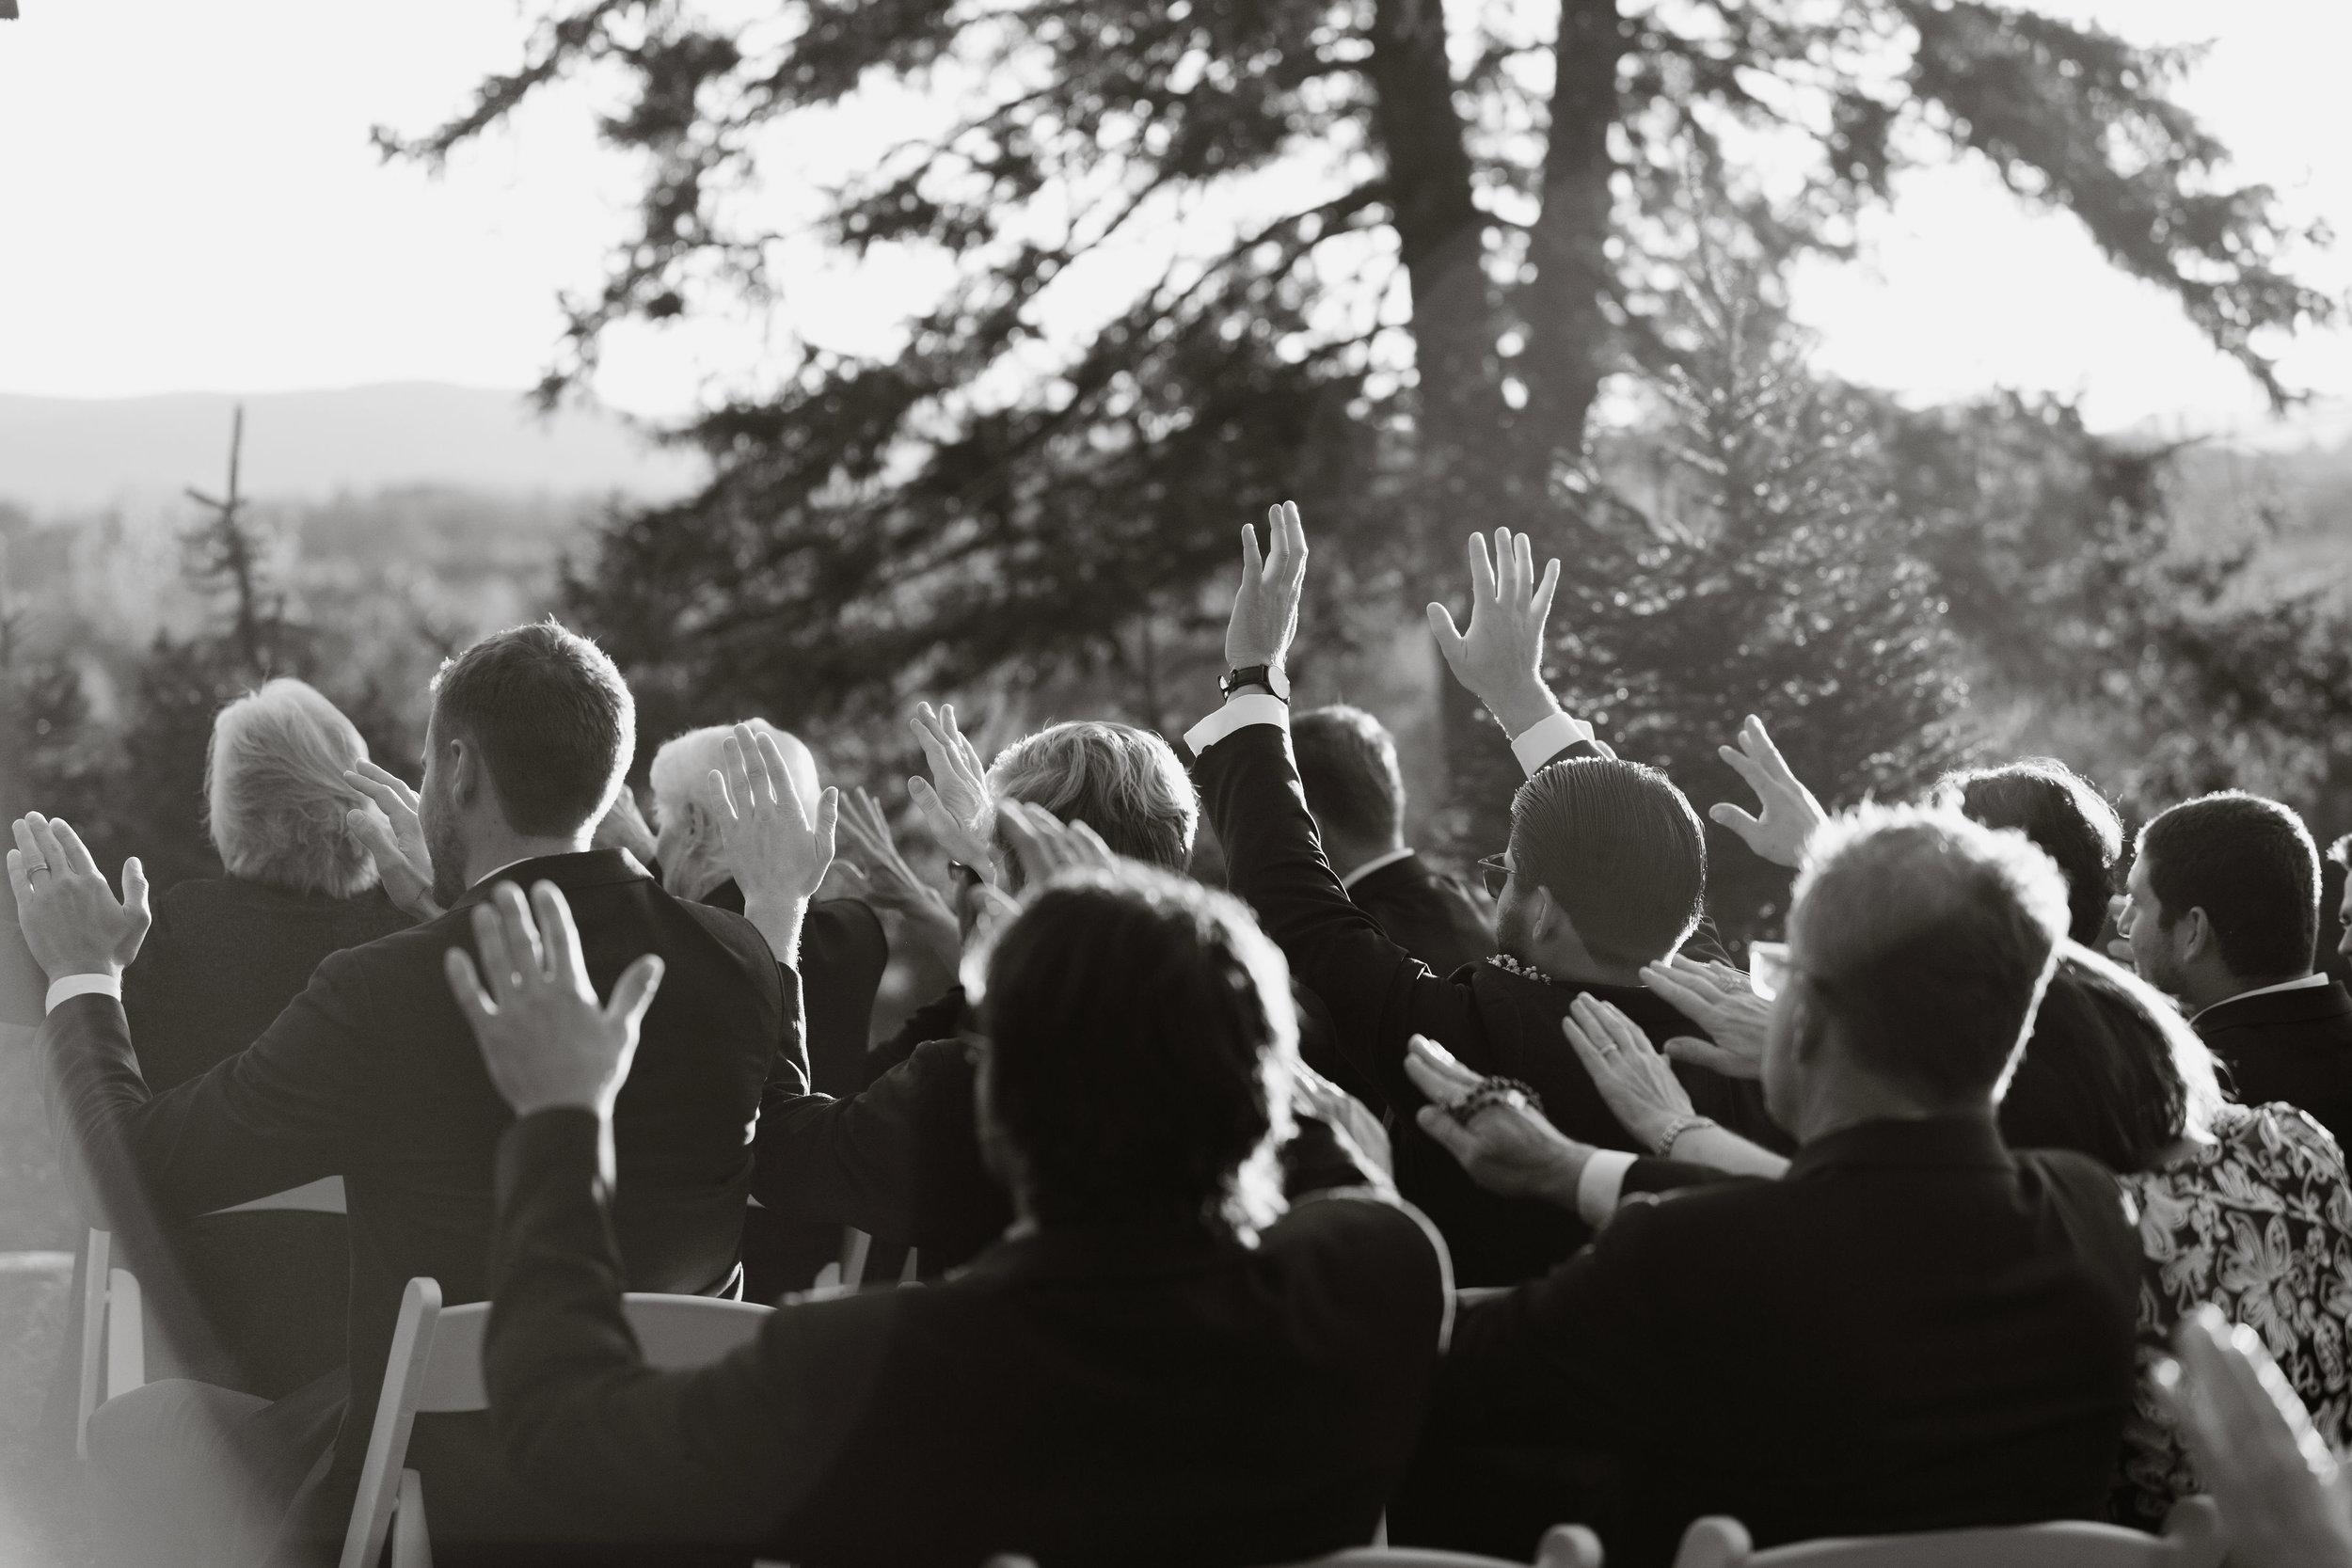 young-love-media-rustic-fall-autumn-wedding-emmerich-tree-farm-hudson-valley-warwick-new-york-ceremony-213.jpg